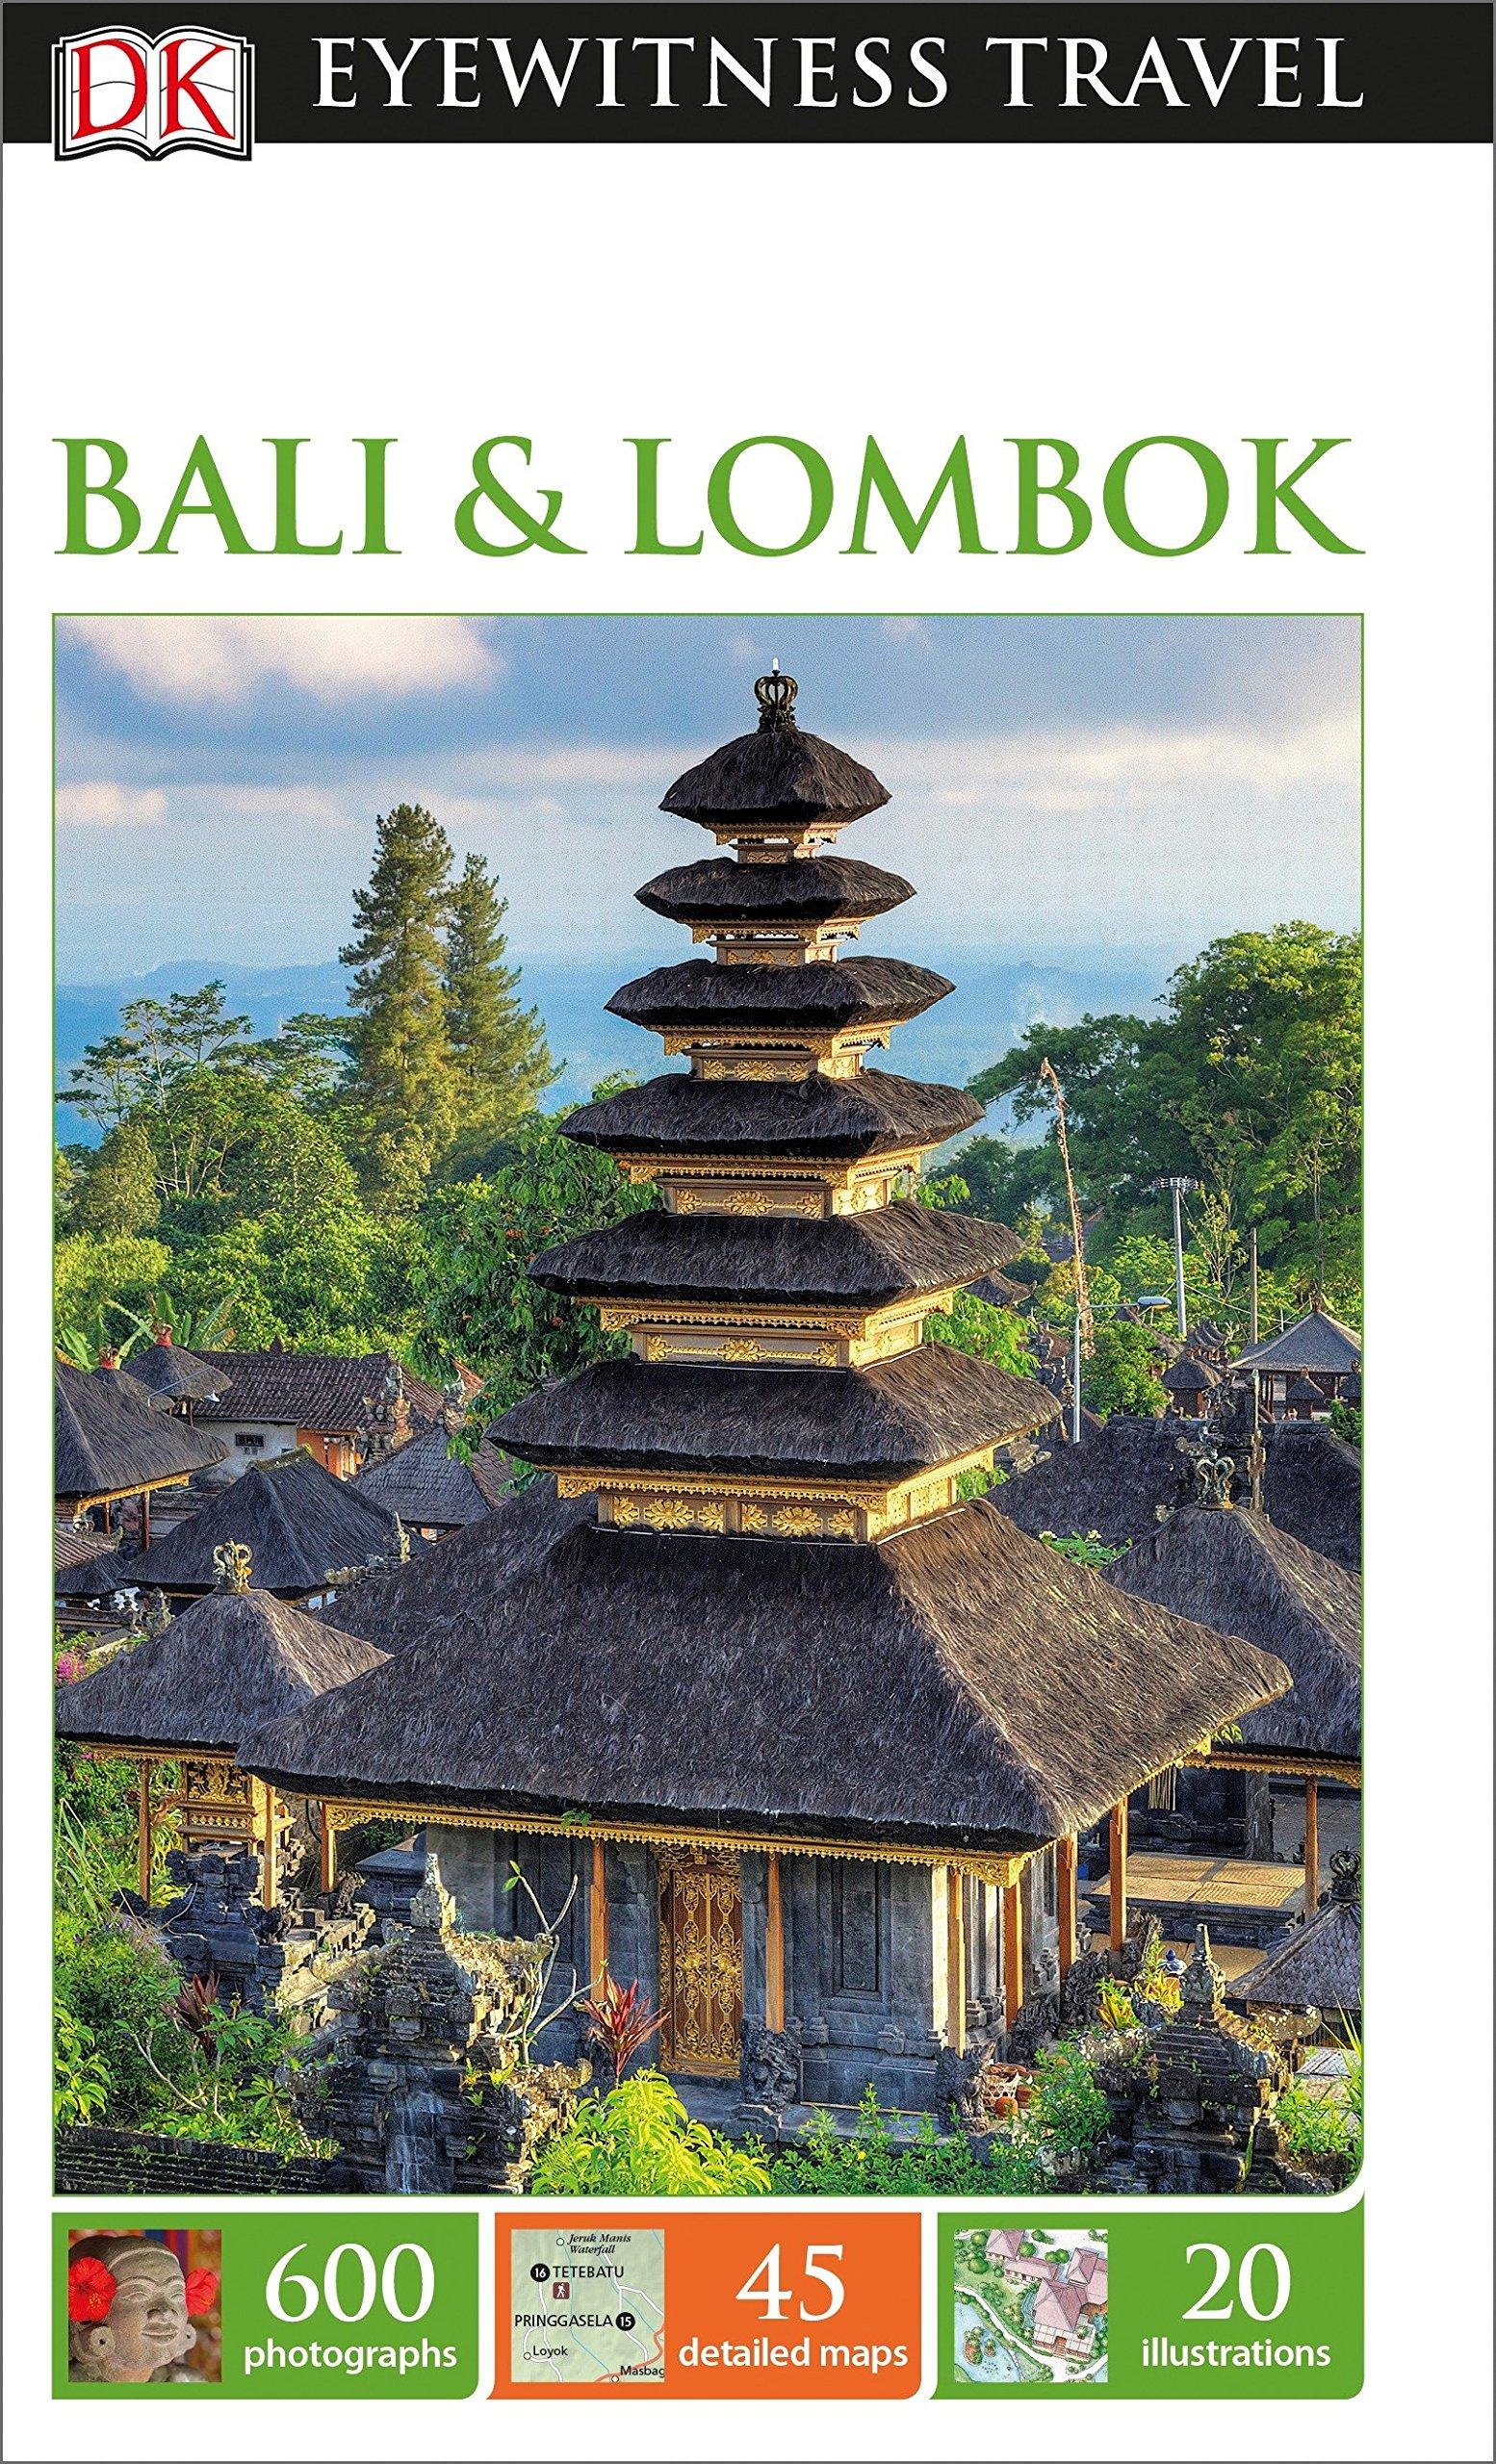 Dk Eyewitness Travel Guide Bali And Lombok Dk Eyewitness